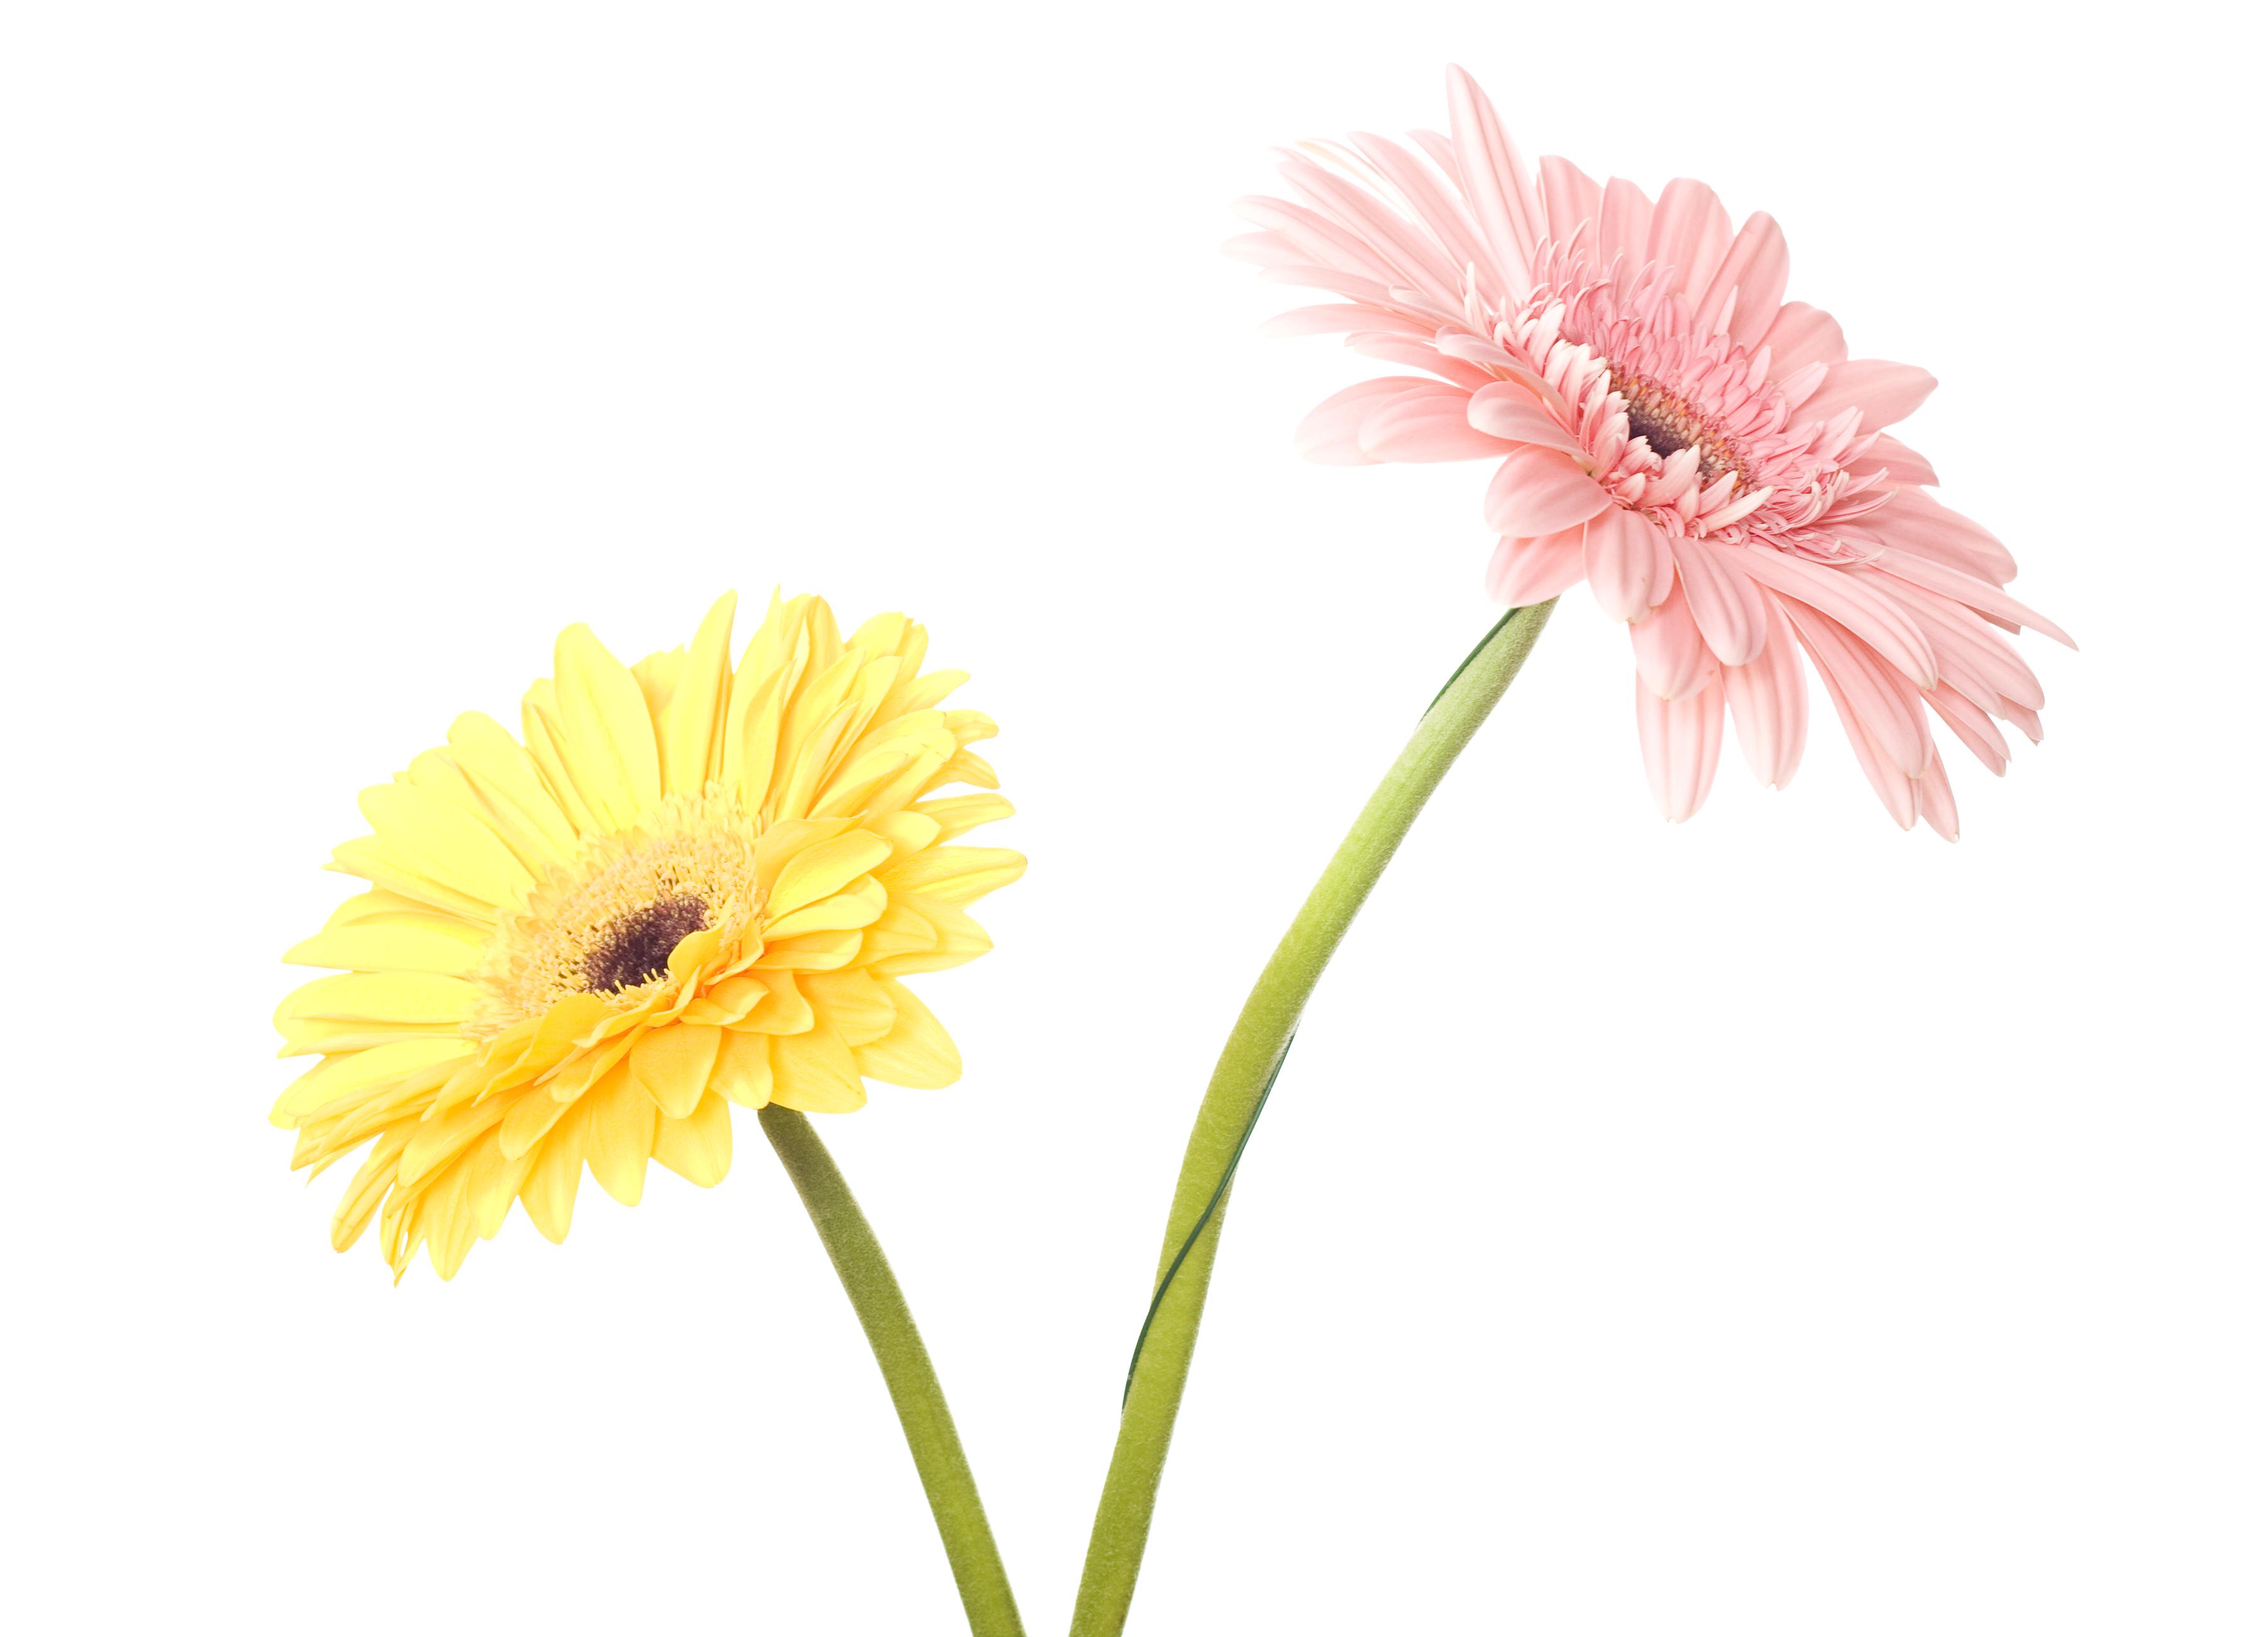 Gerbera, Closeup, Detail, Flora, Floral, HQ Photo